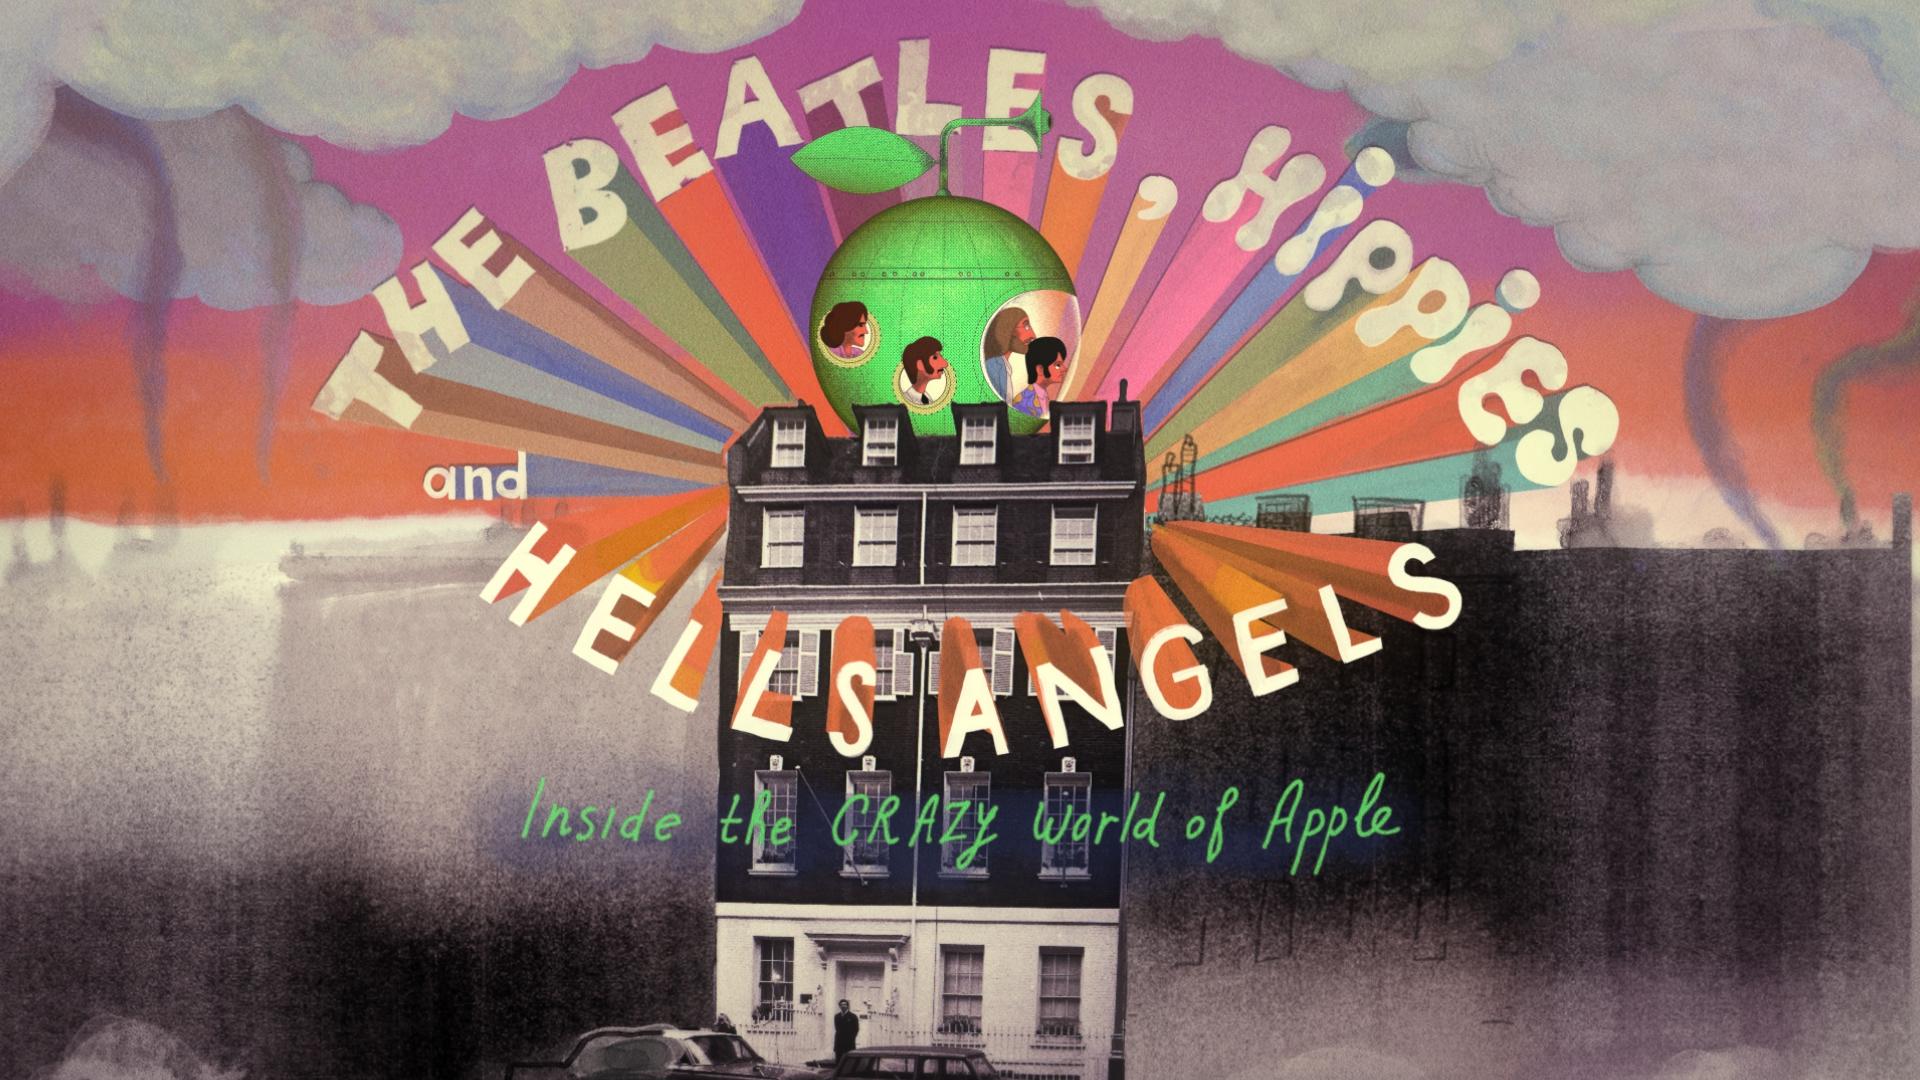 Apple_Beatles_Titles_Still_CREDIT_FONS_SCHIEDON_1.1.1.jpg